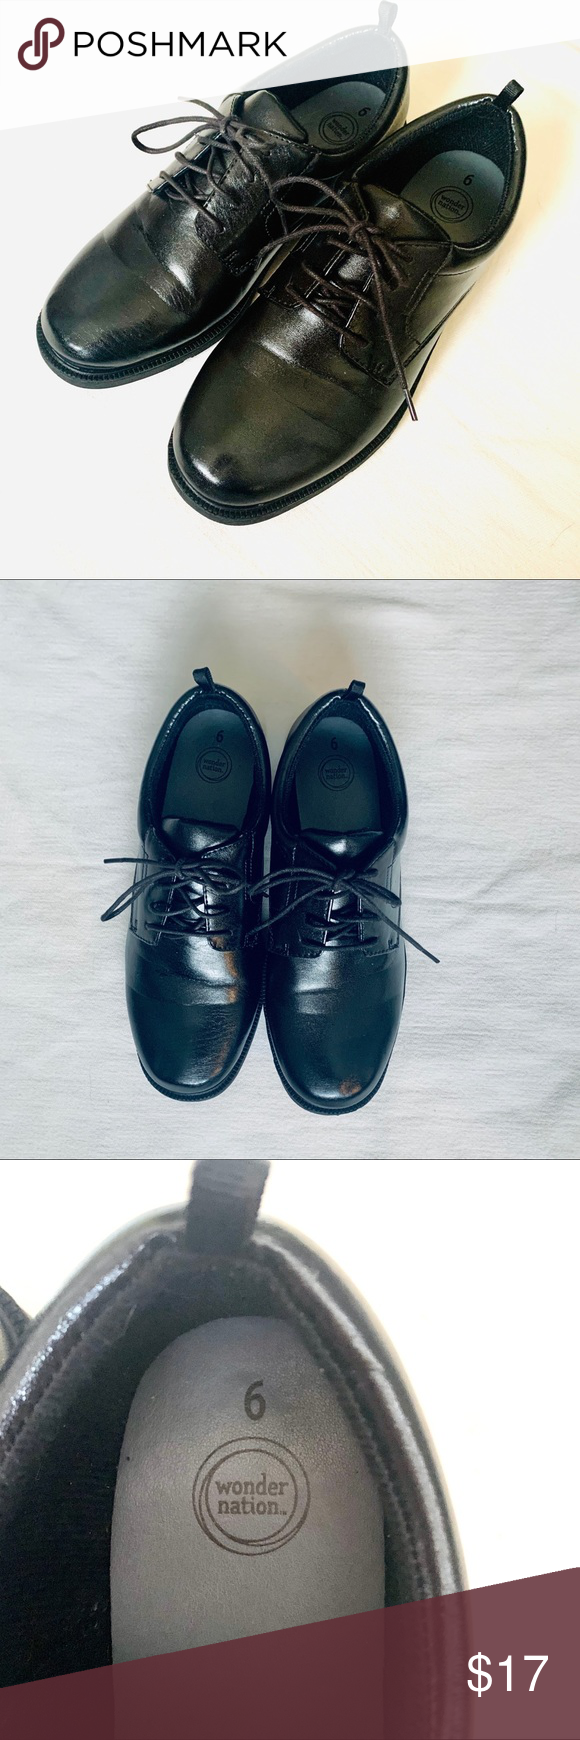 Boys dress shoes size 6 (big boys) in